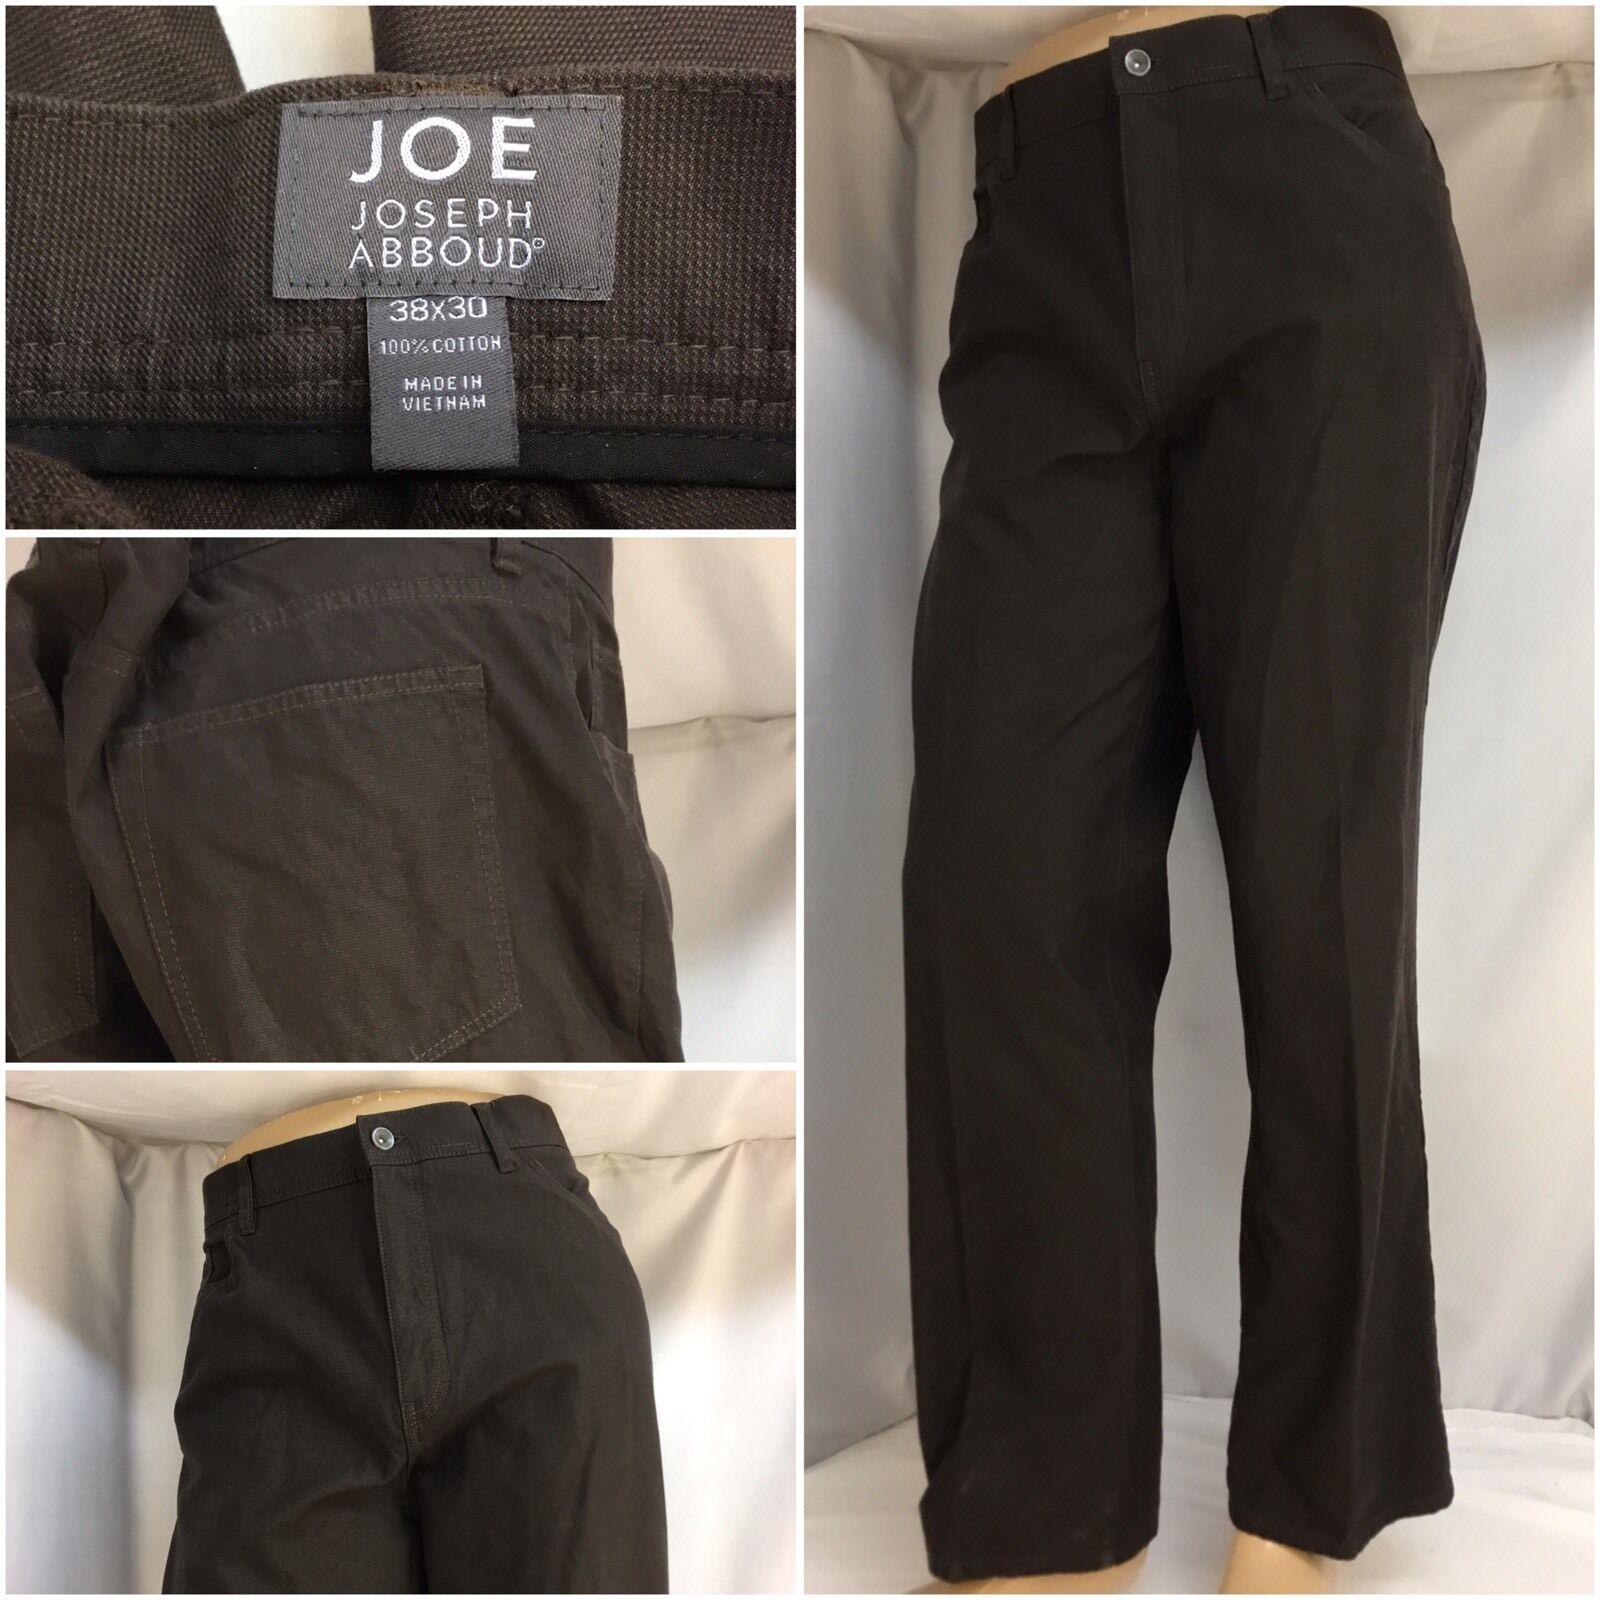 Joseph Abboud Joe Pants 38x30 Brown 100% Cotton Flat Front NWOT YGI 2857